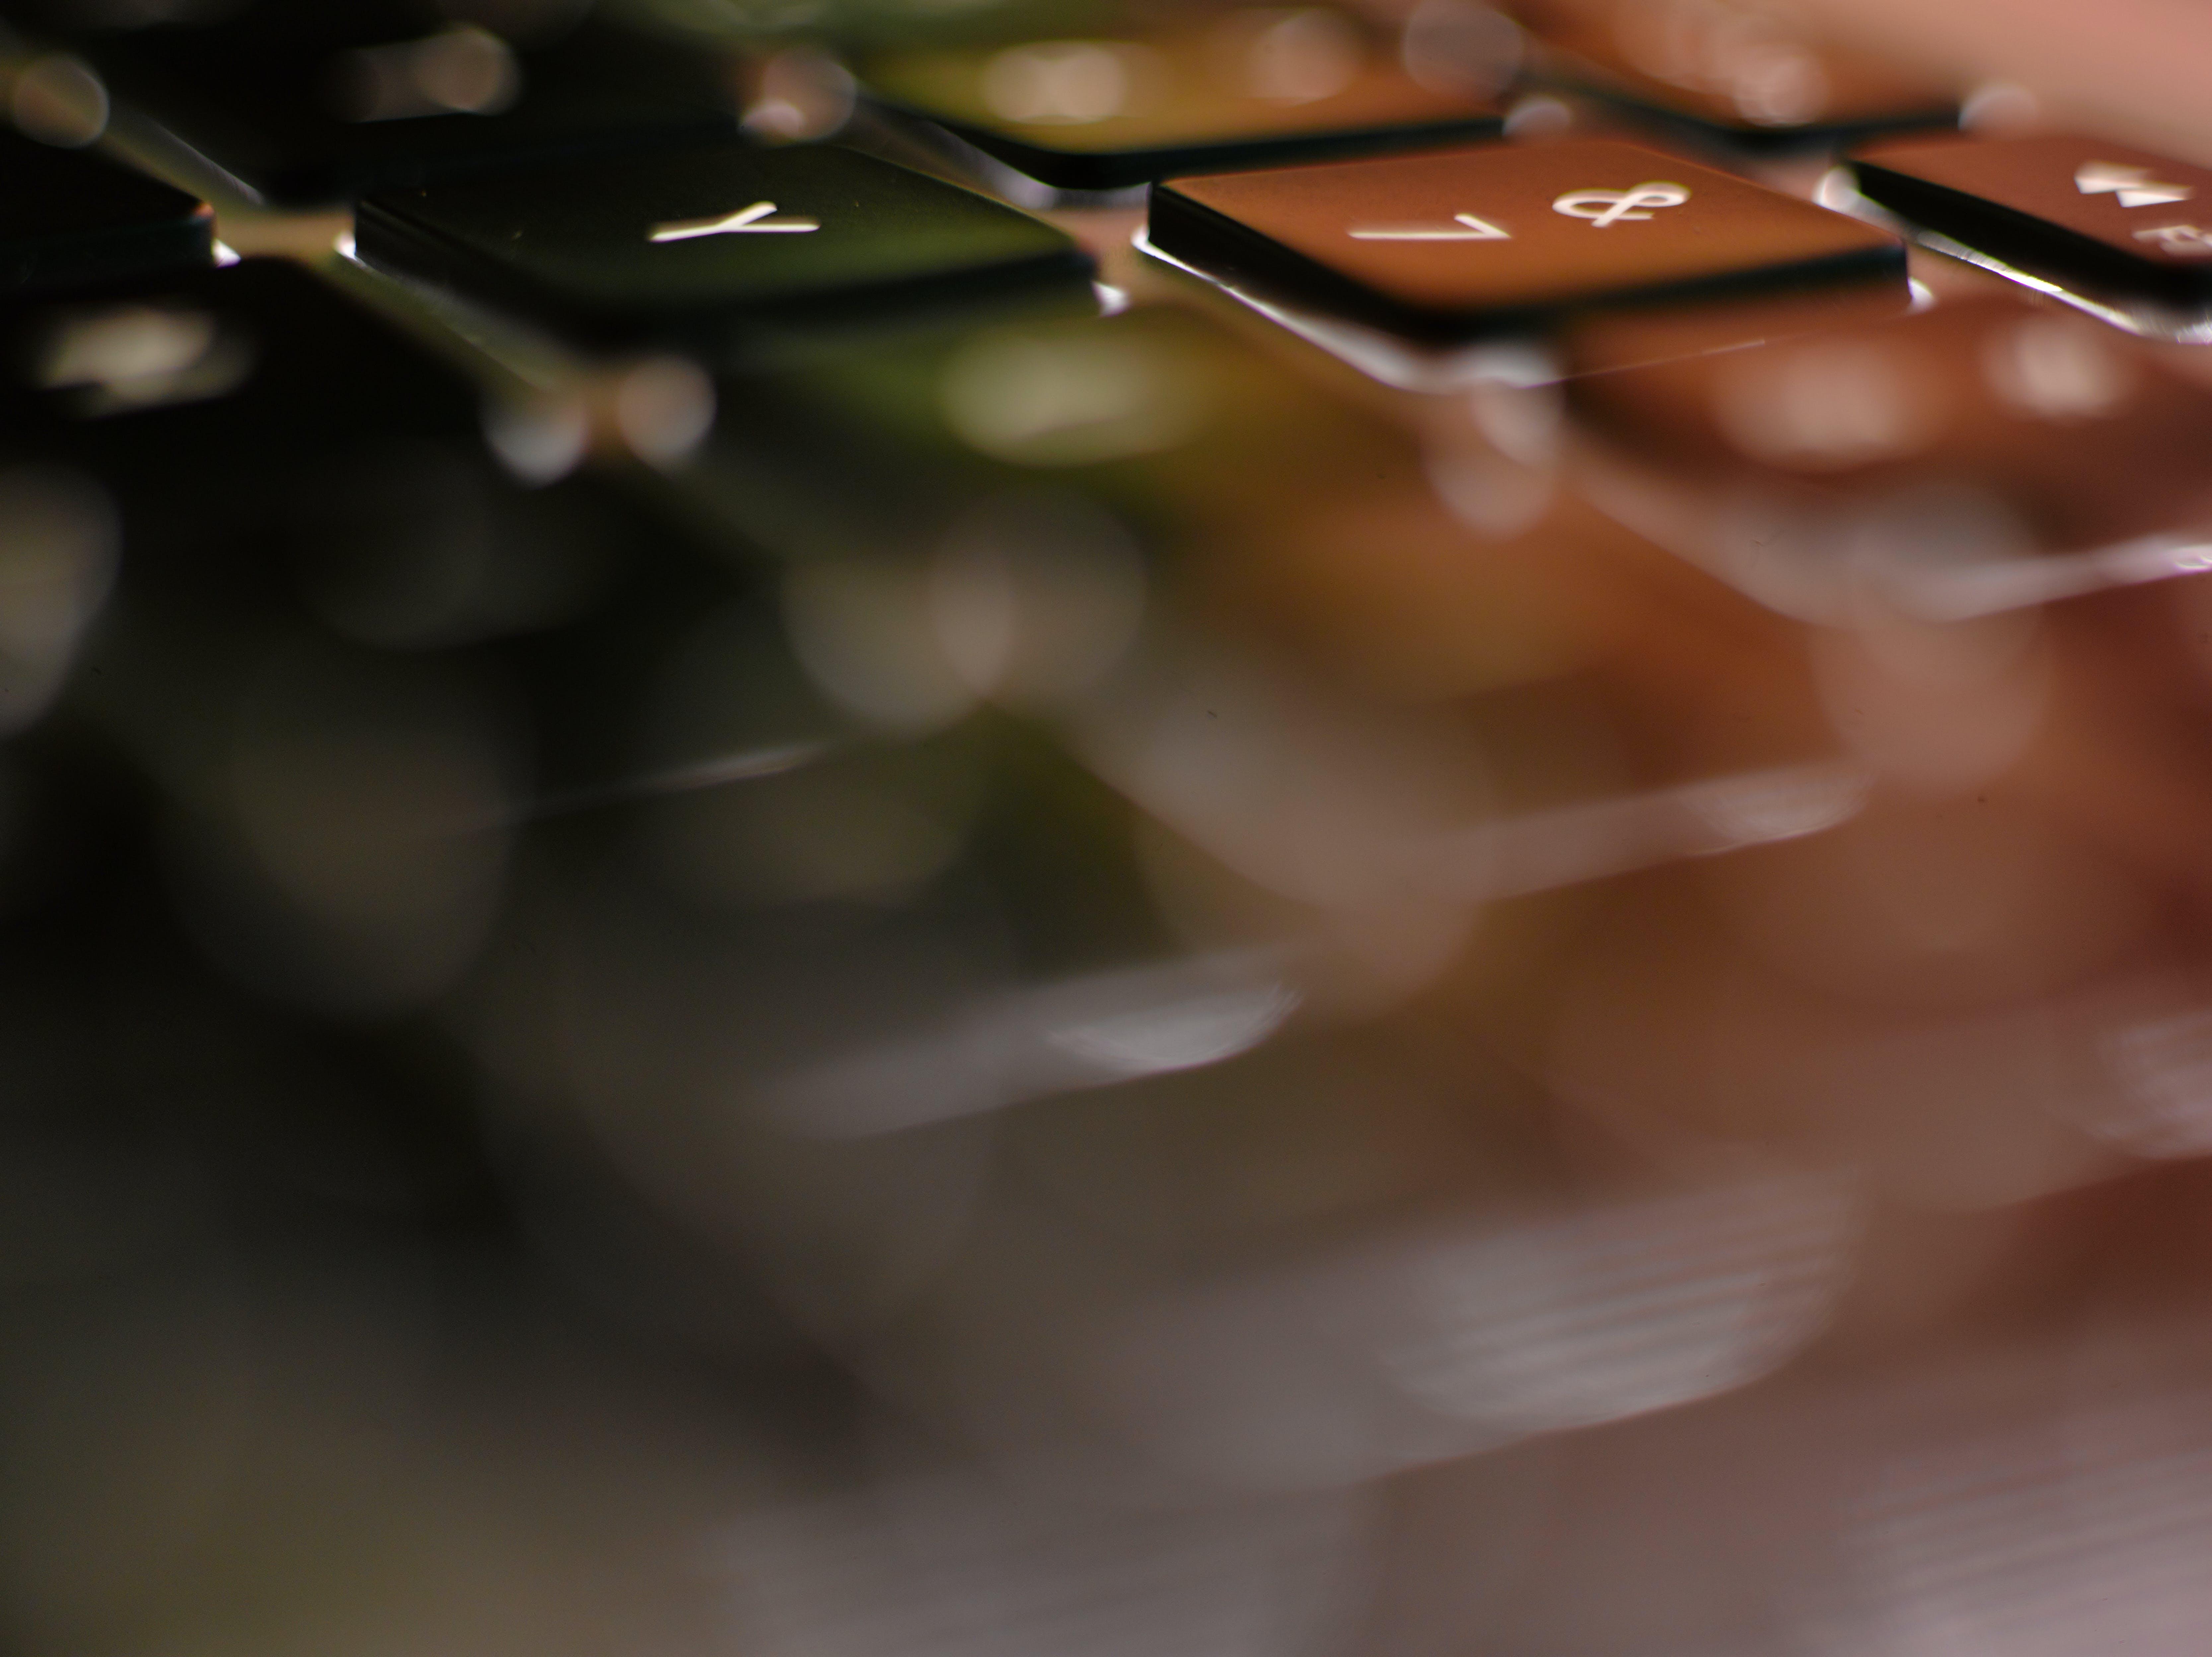 Free stock photo of apple keyboard, keyboard